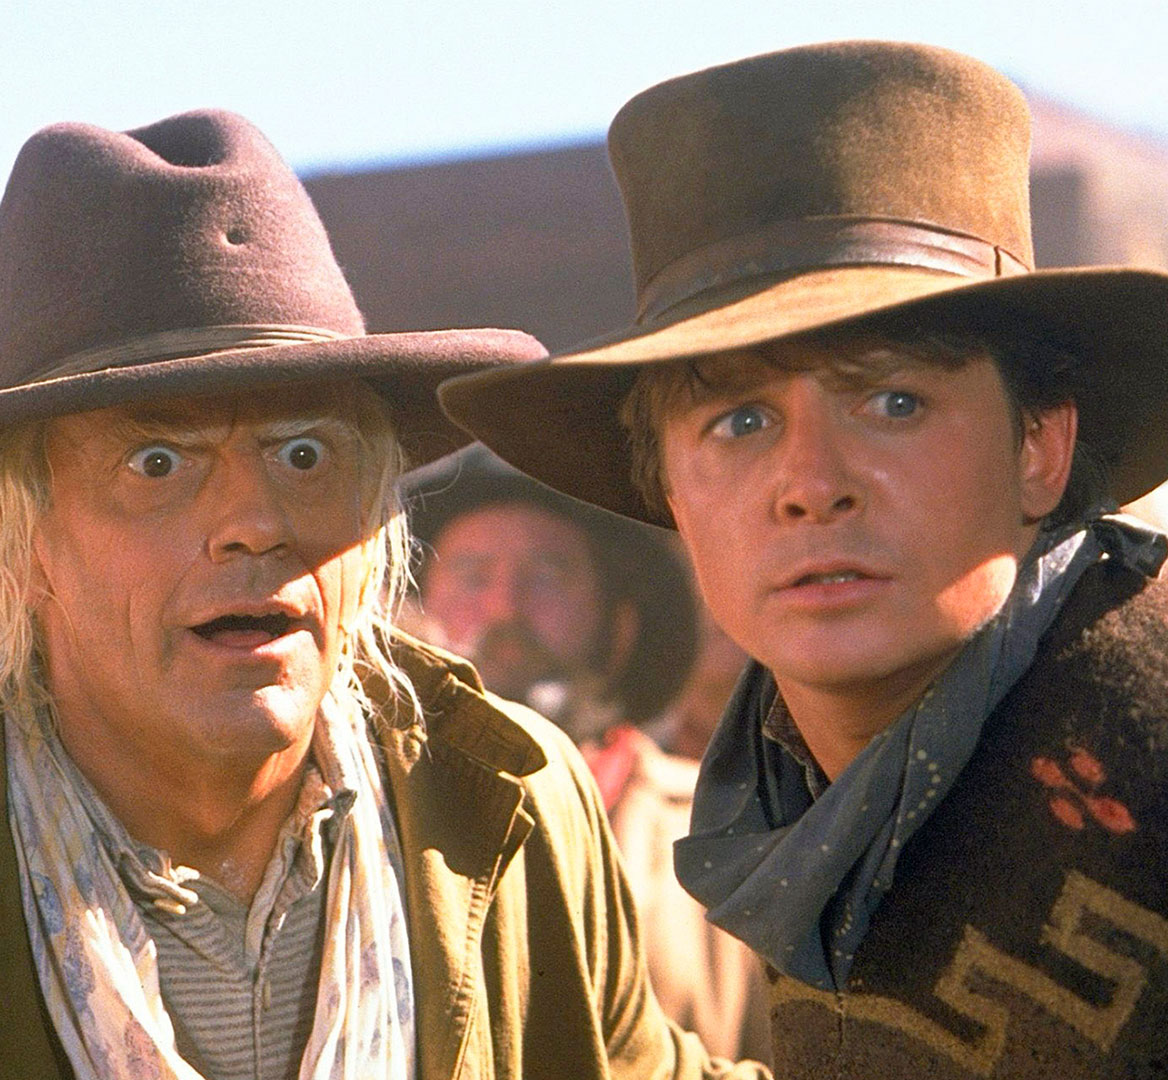 best western movies netflix mobile